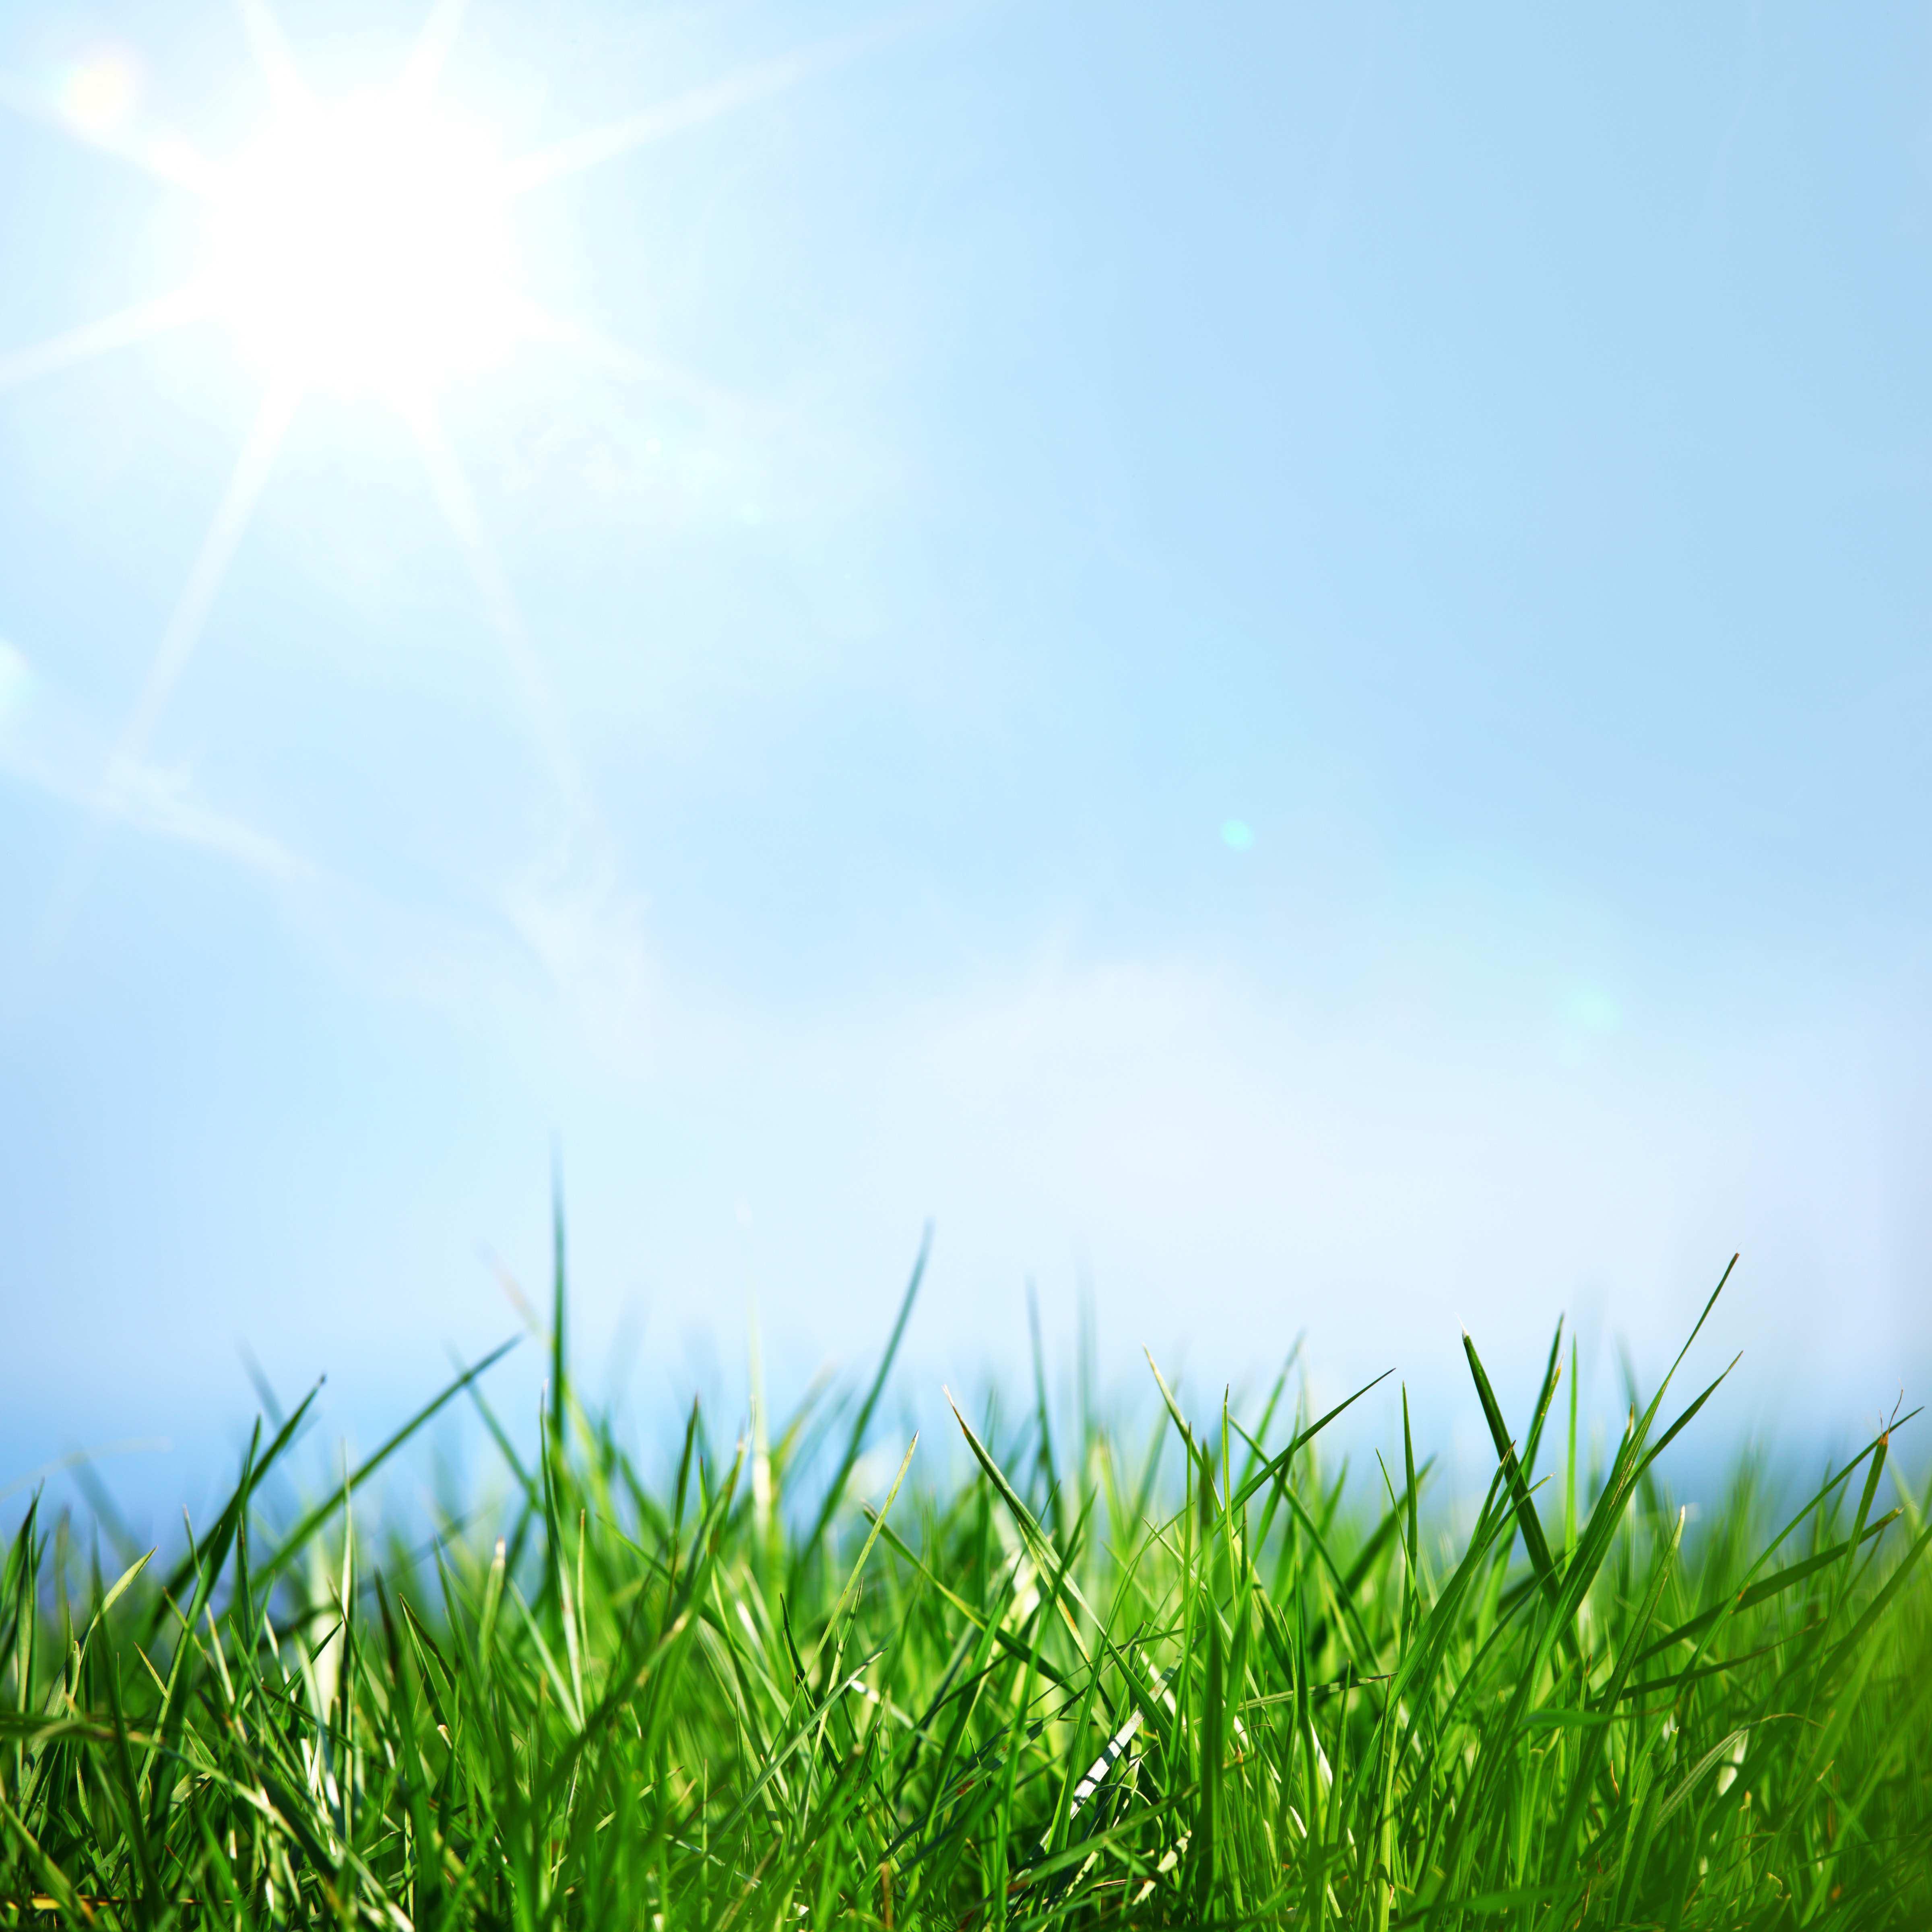 Grass Landscape Urban grass might be greener but is it greener shutterstock75234670 workwithnaturefo